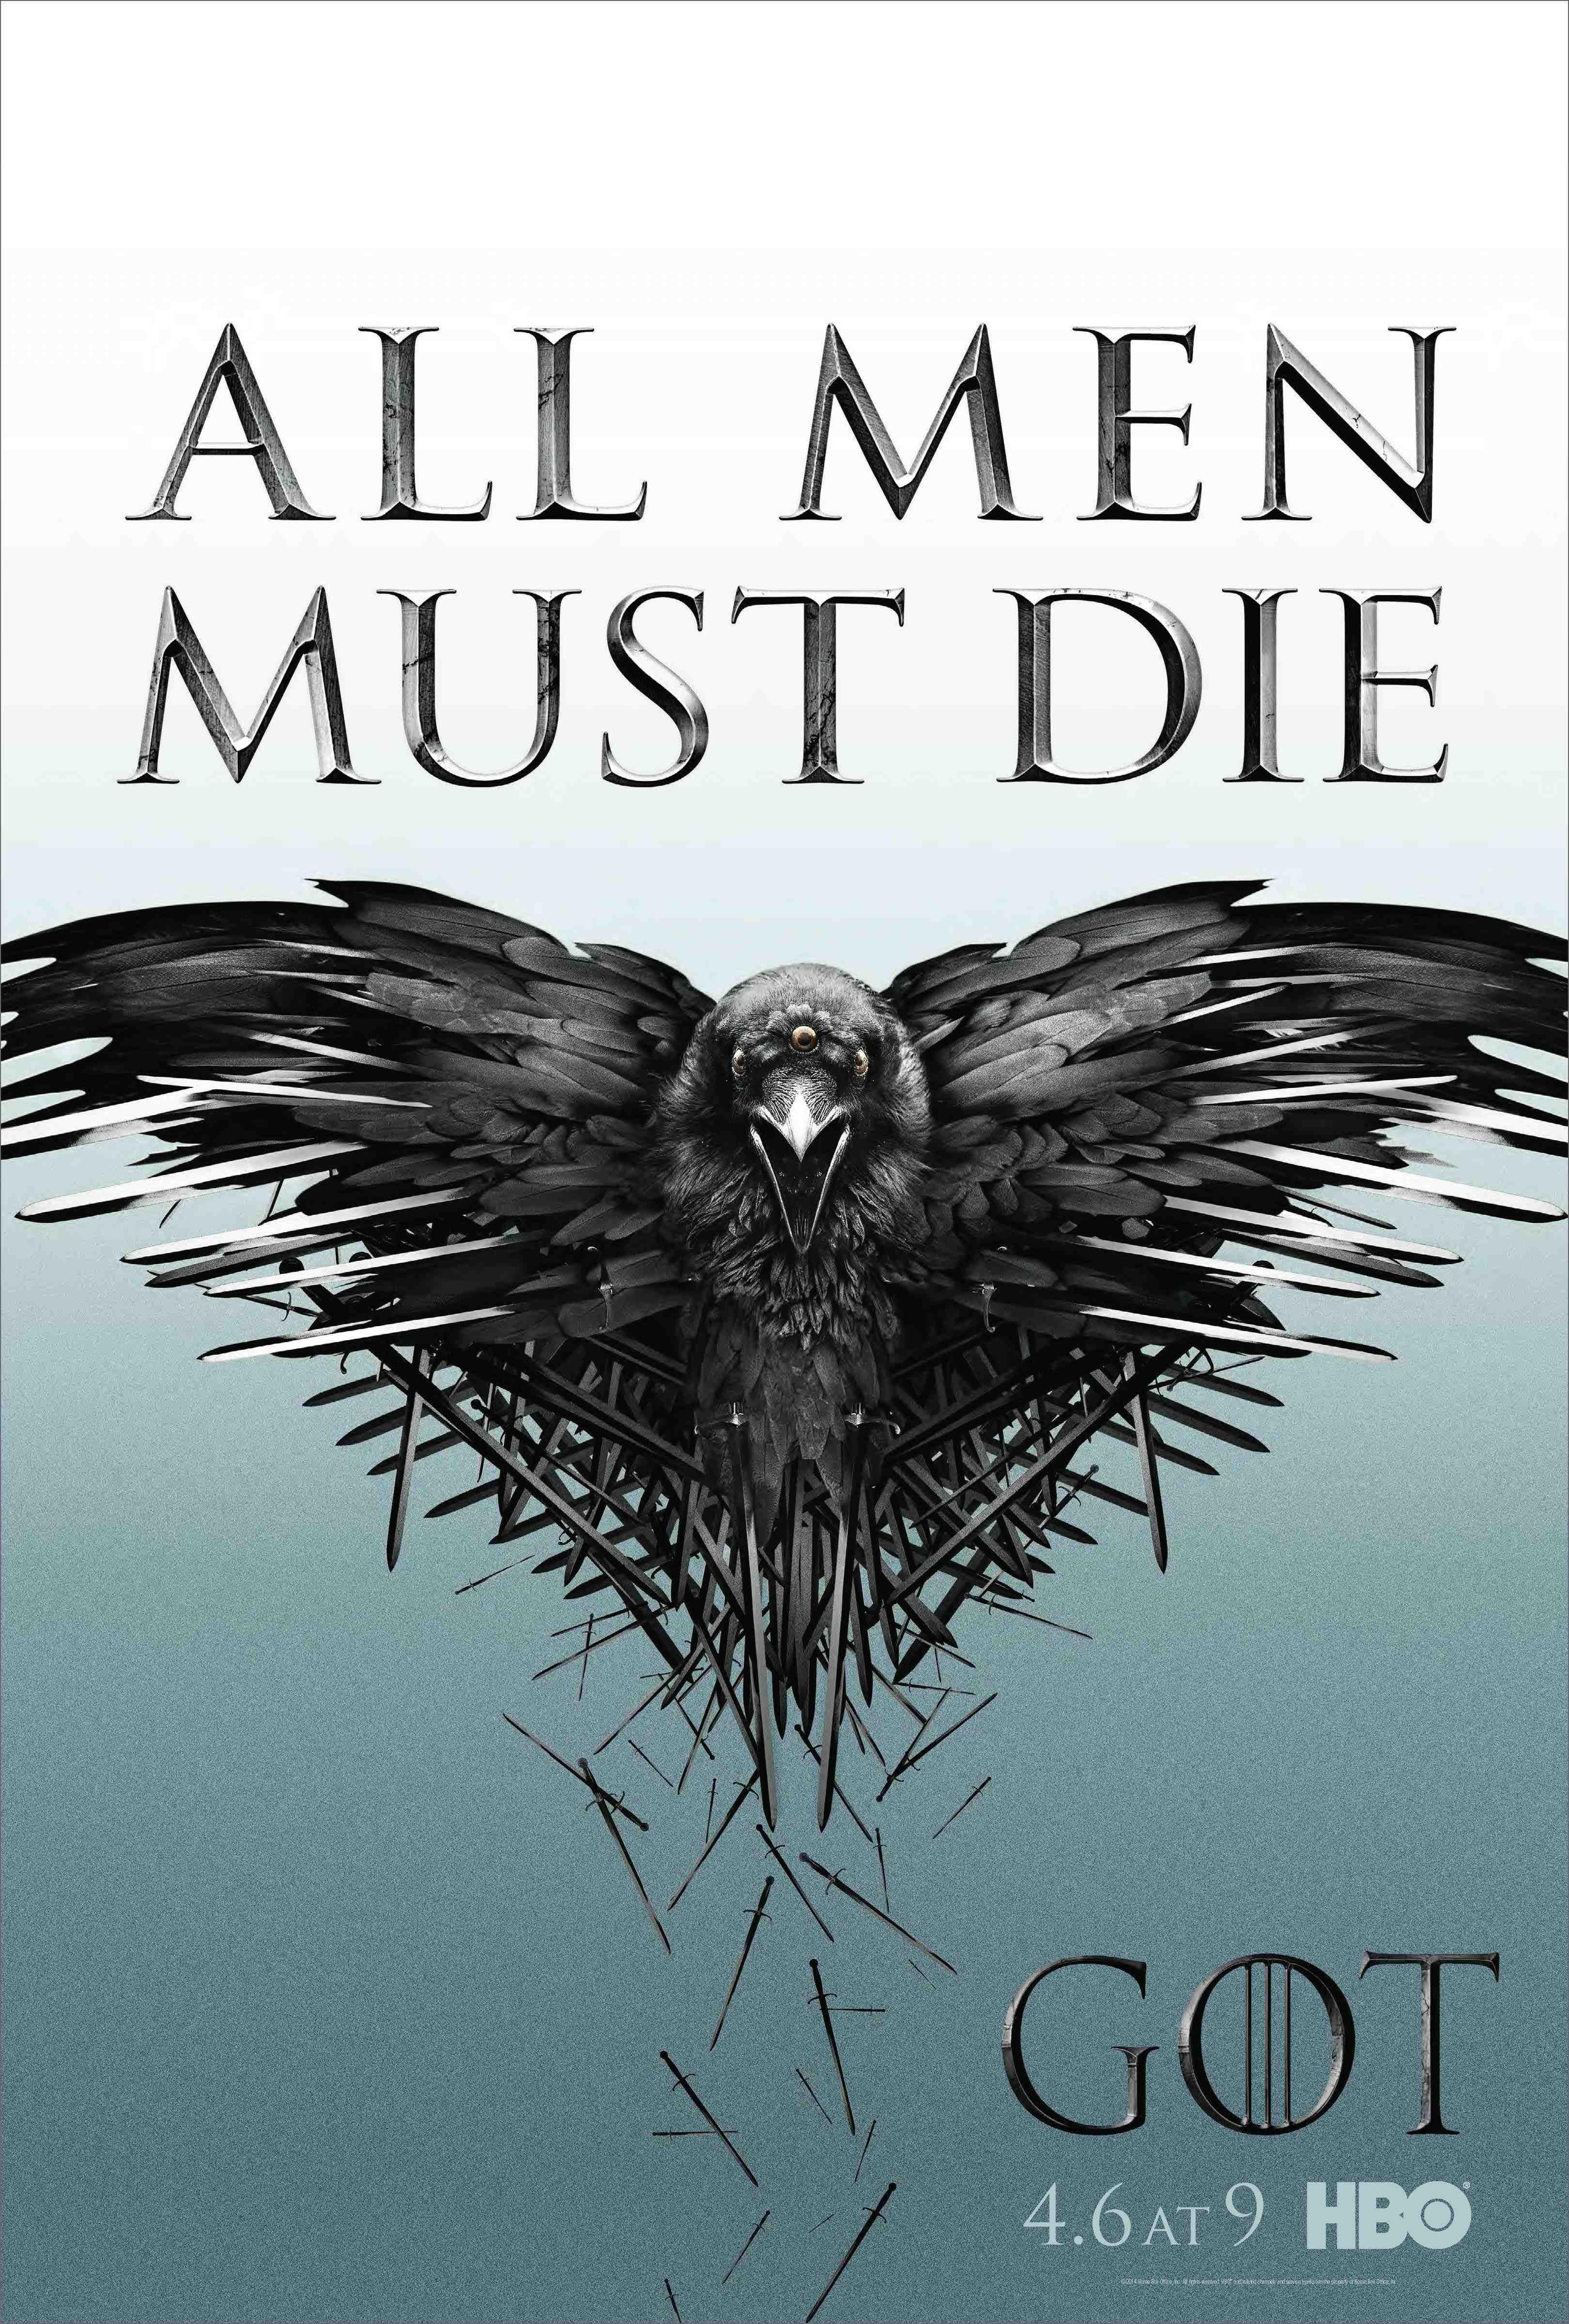 Game of Thrones: Season 5 Photo Gallery - IGN